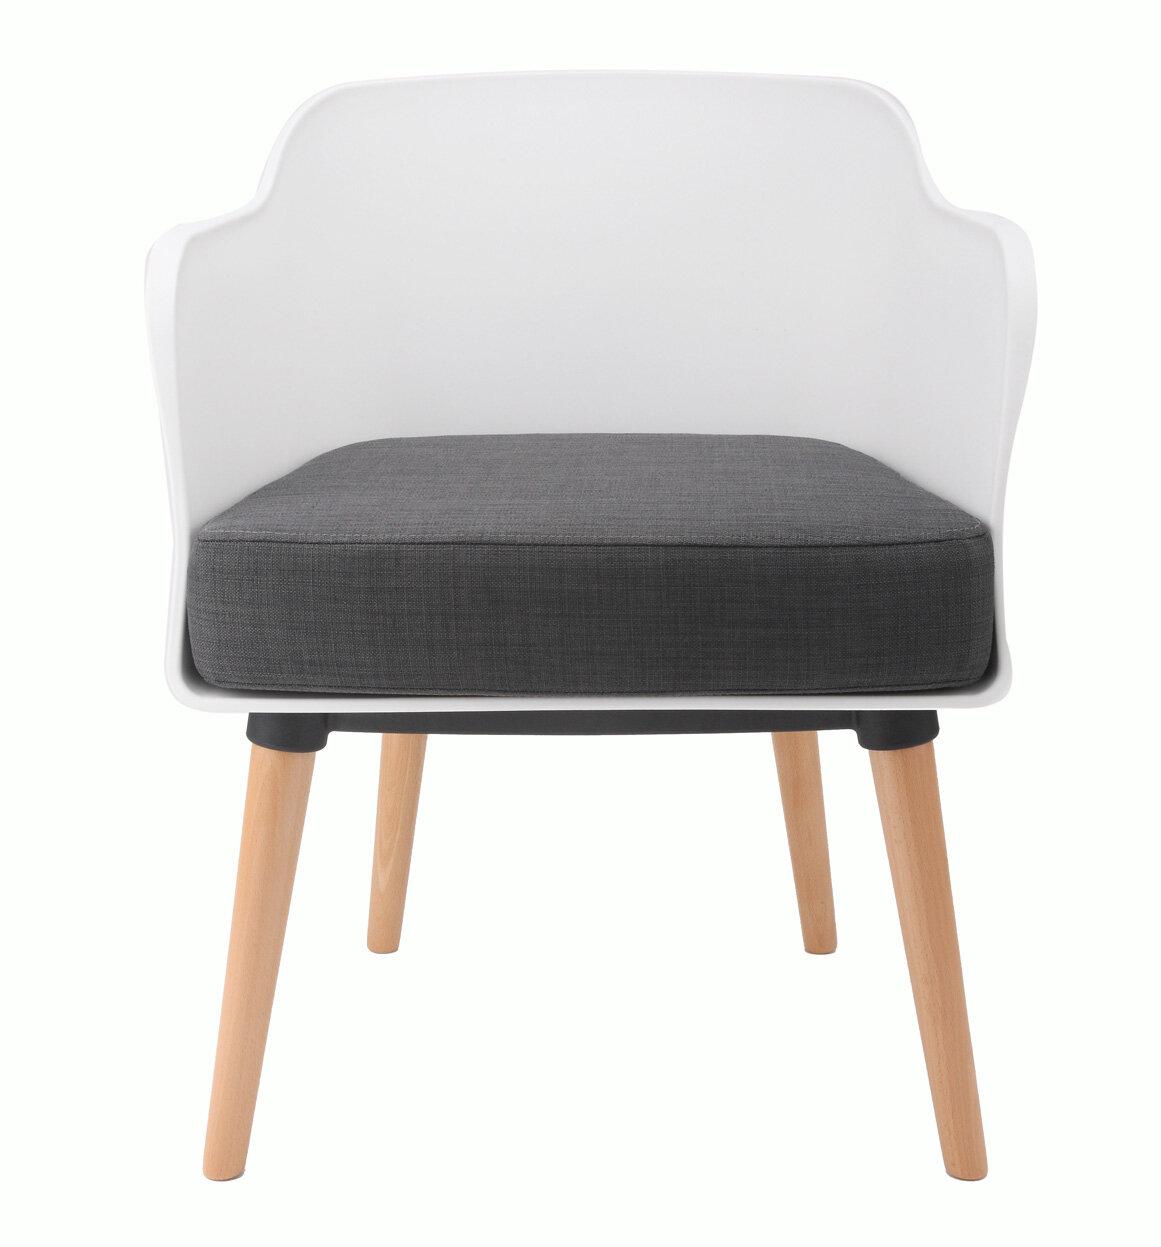 Emodern decor cali armchair reviews wayfair